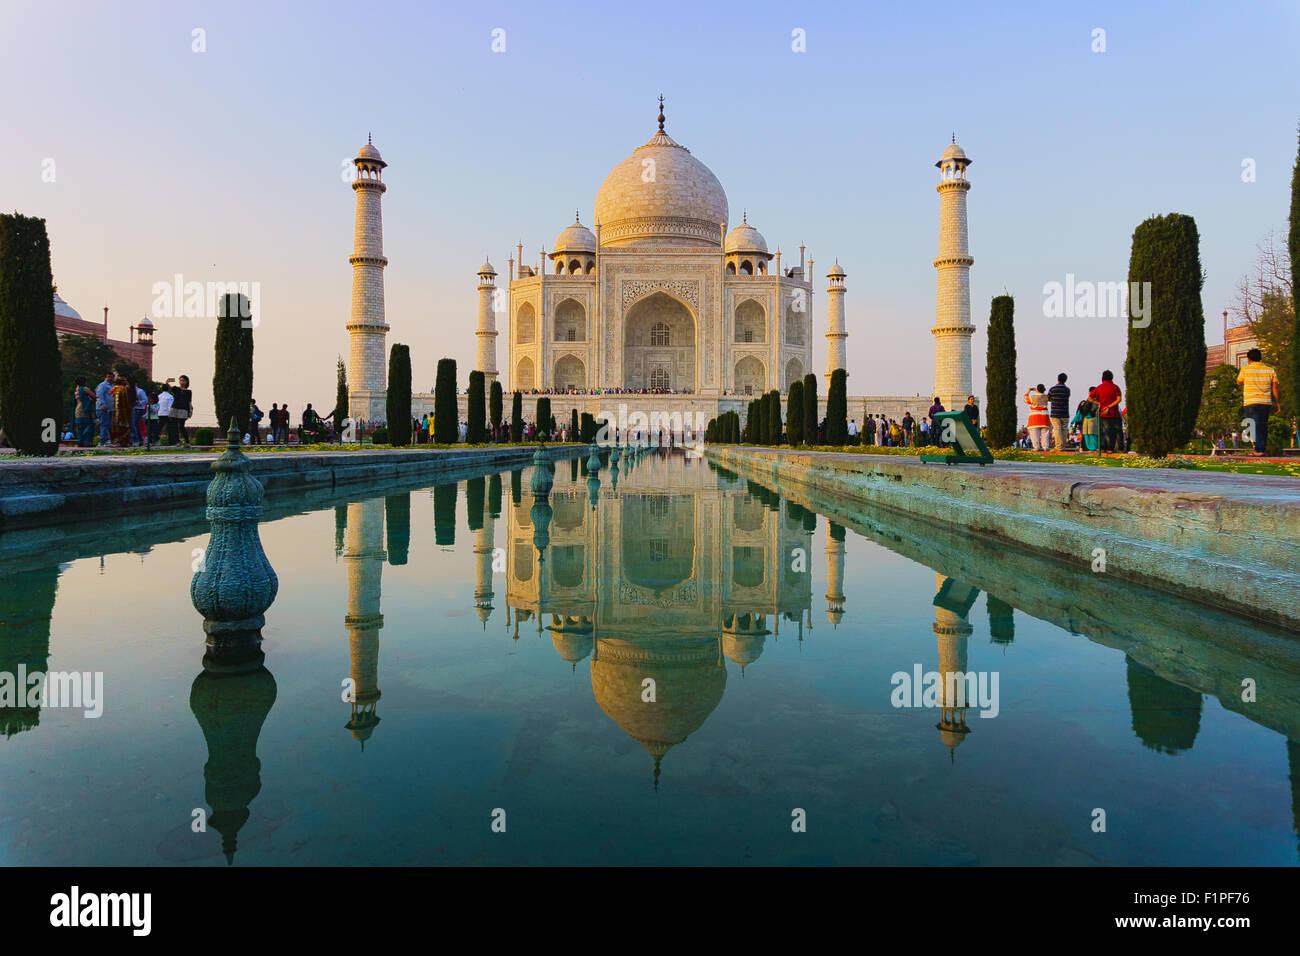 Taj Mahal is the world heritage monument. - Stock Image